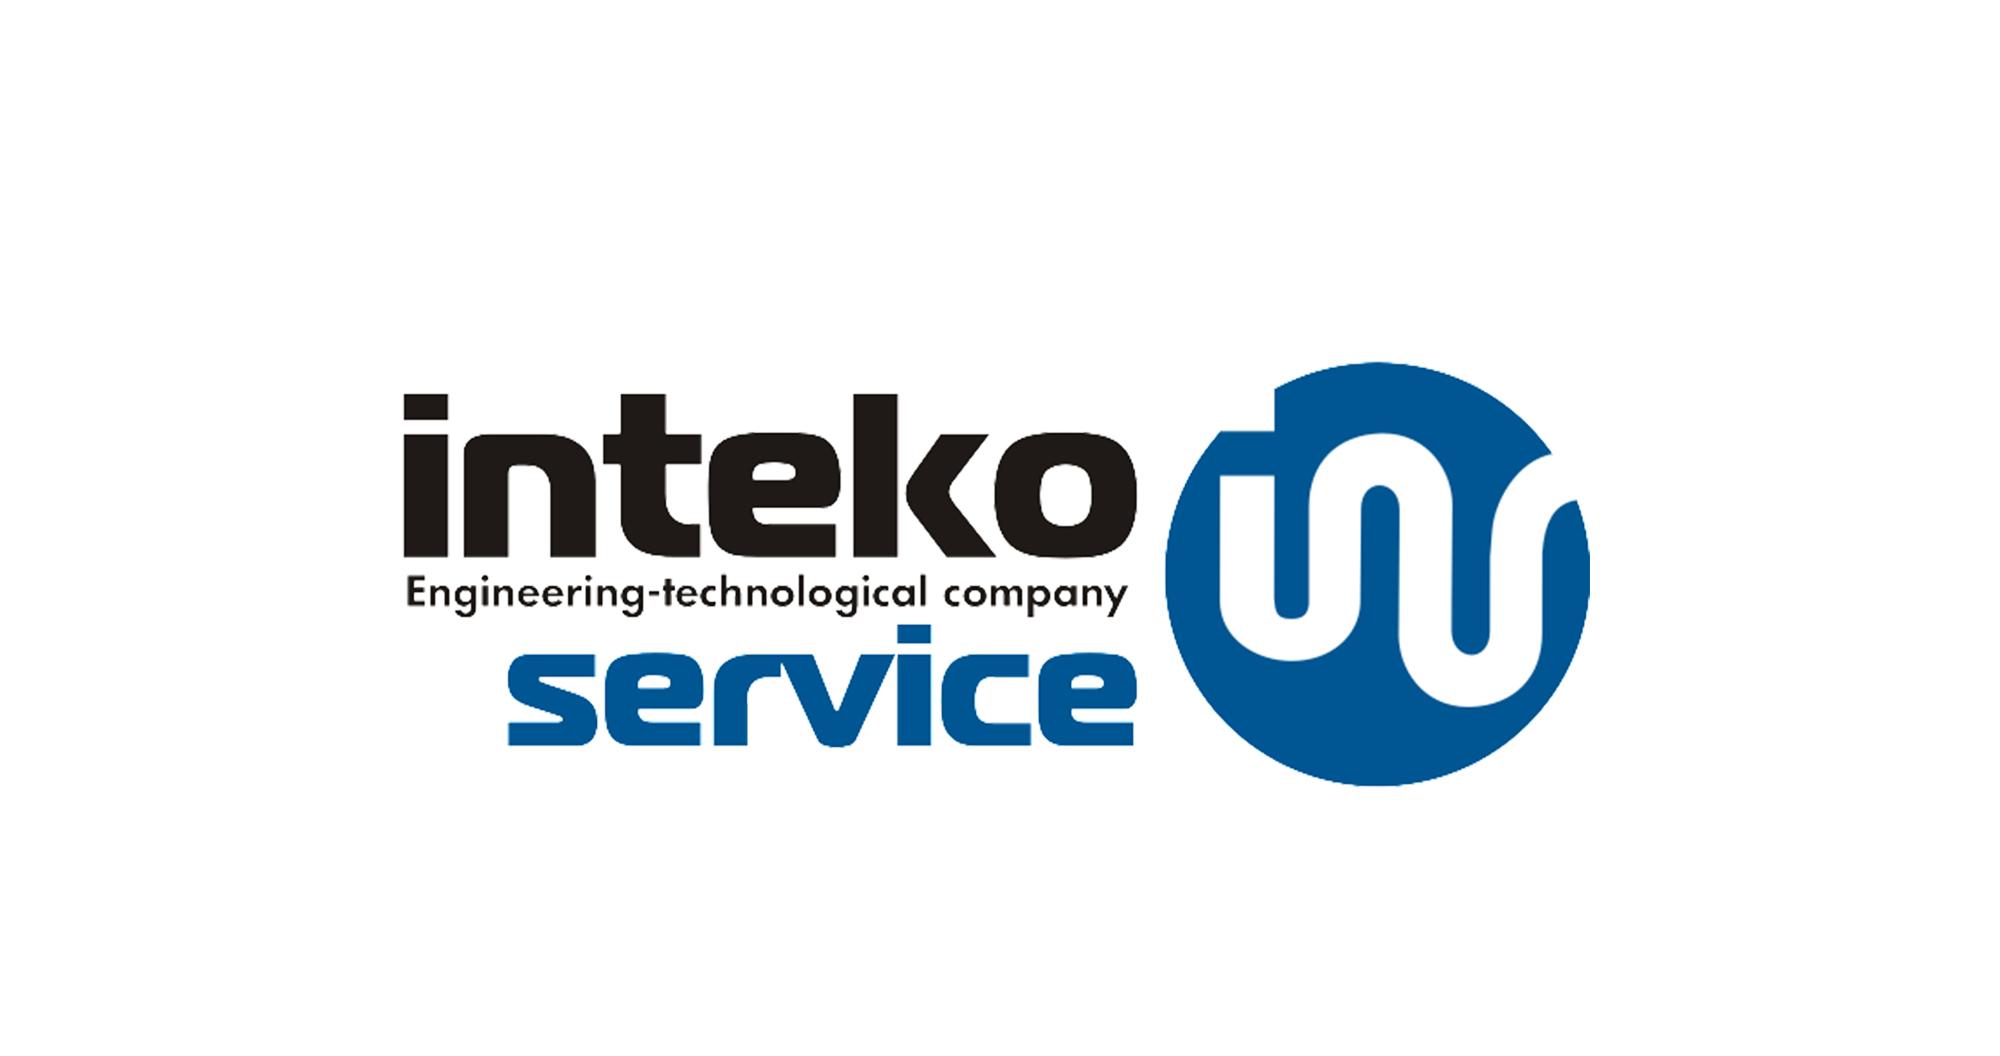 https://www.tatum-design.com/wp-content/uploads/2015/02/inteko-logo-copy.jpg